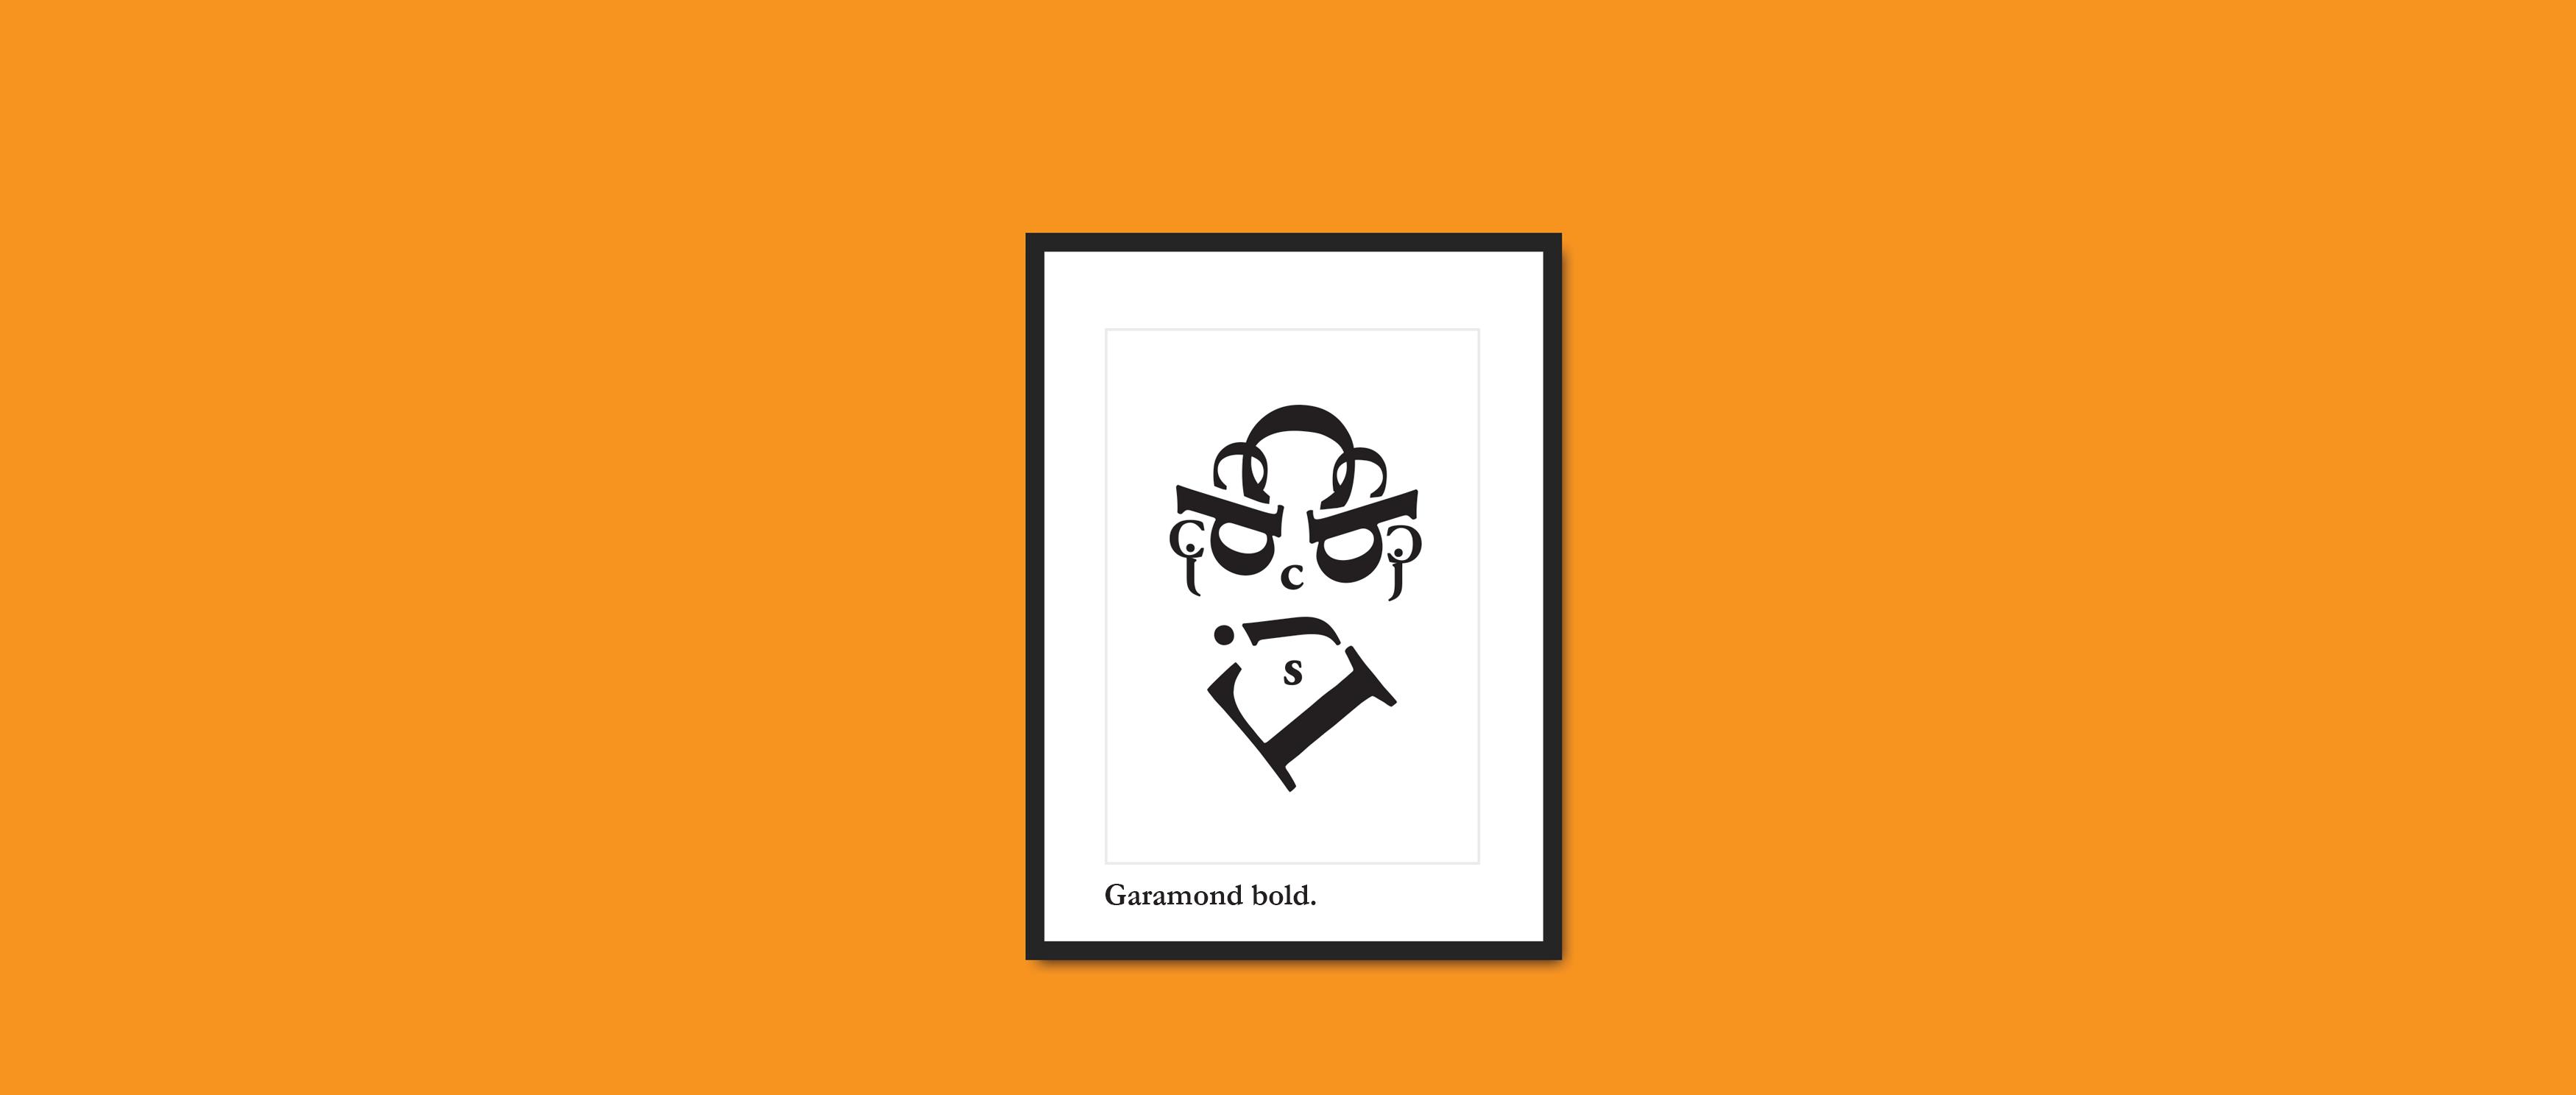 Garamond-bold - Chemical Code Limited